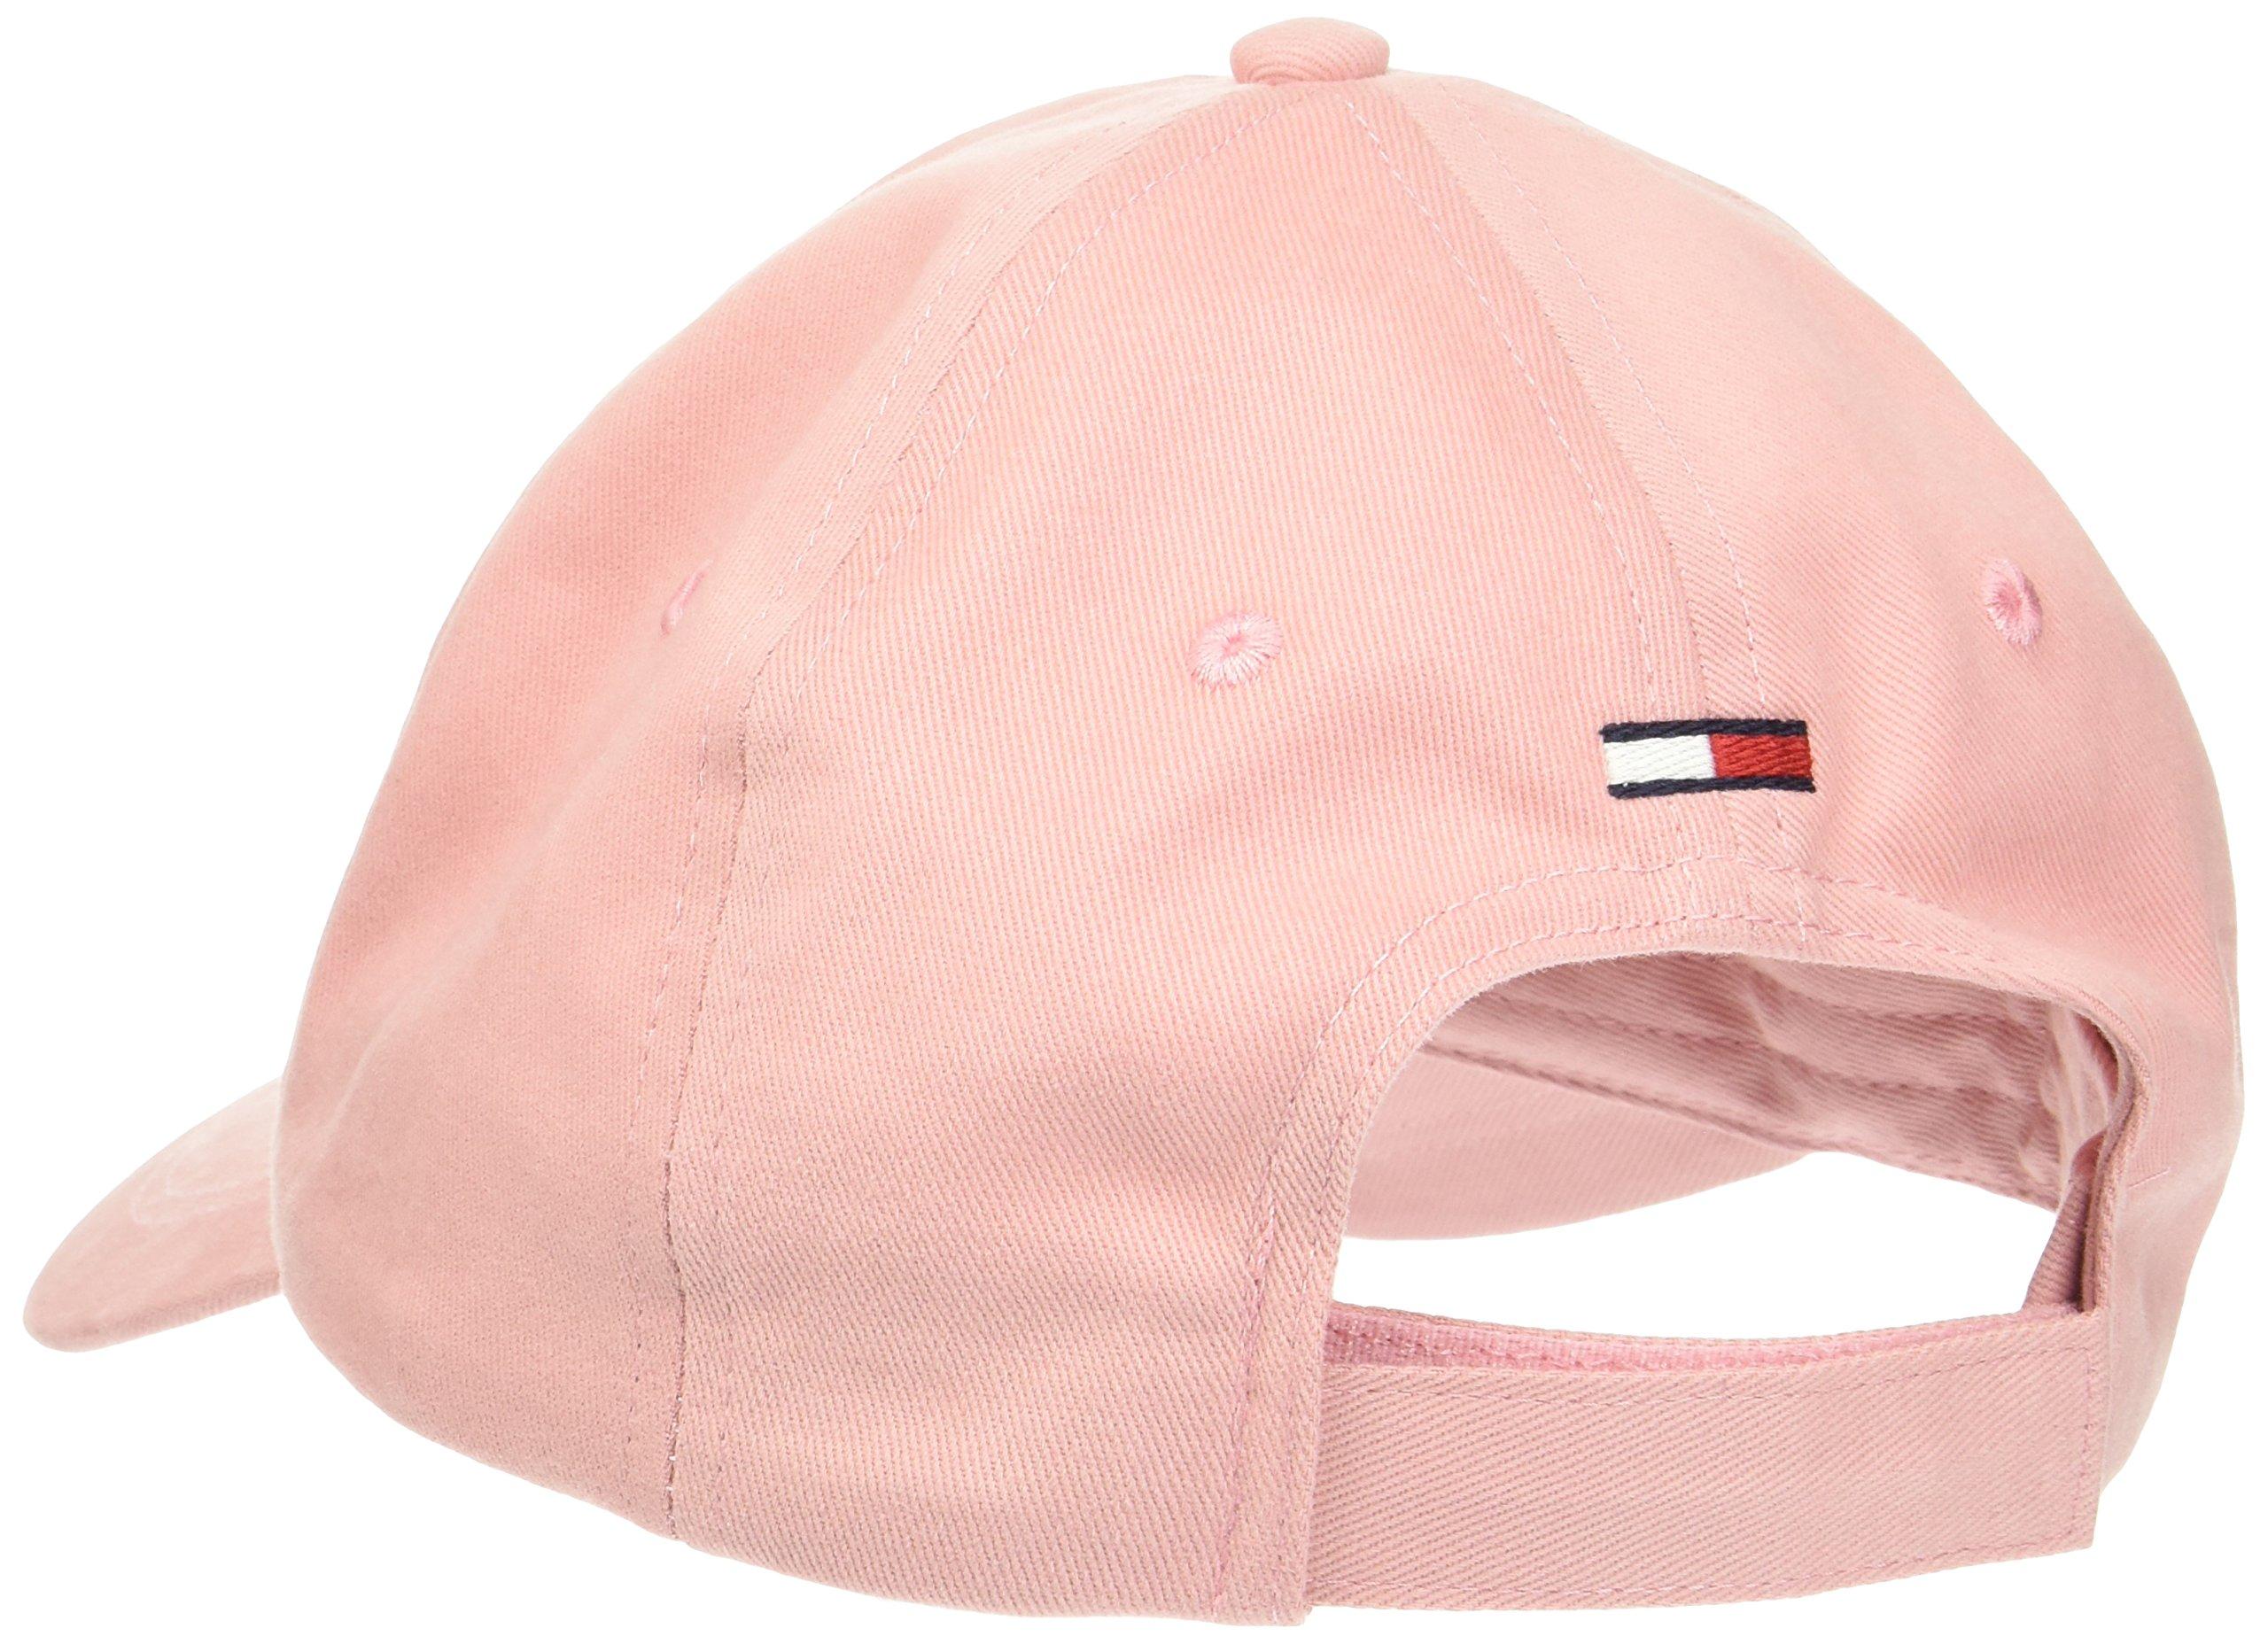 Tommy Hilfiger THD Soft Cap Gorra de béisbol, Naranja (Confetti 630), (Talla del Fabricante: Talla única) para Mujer